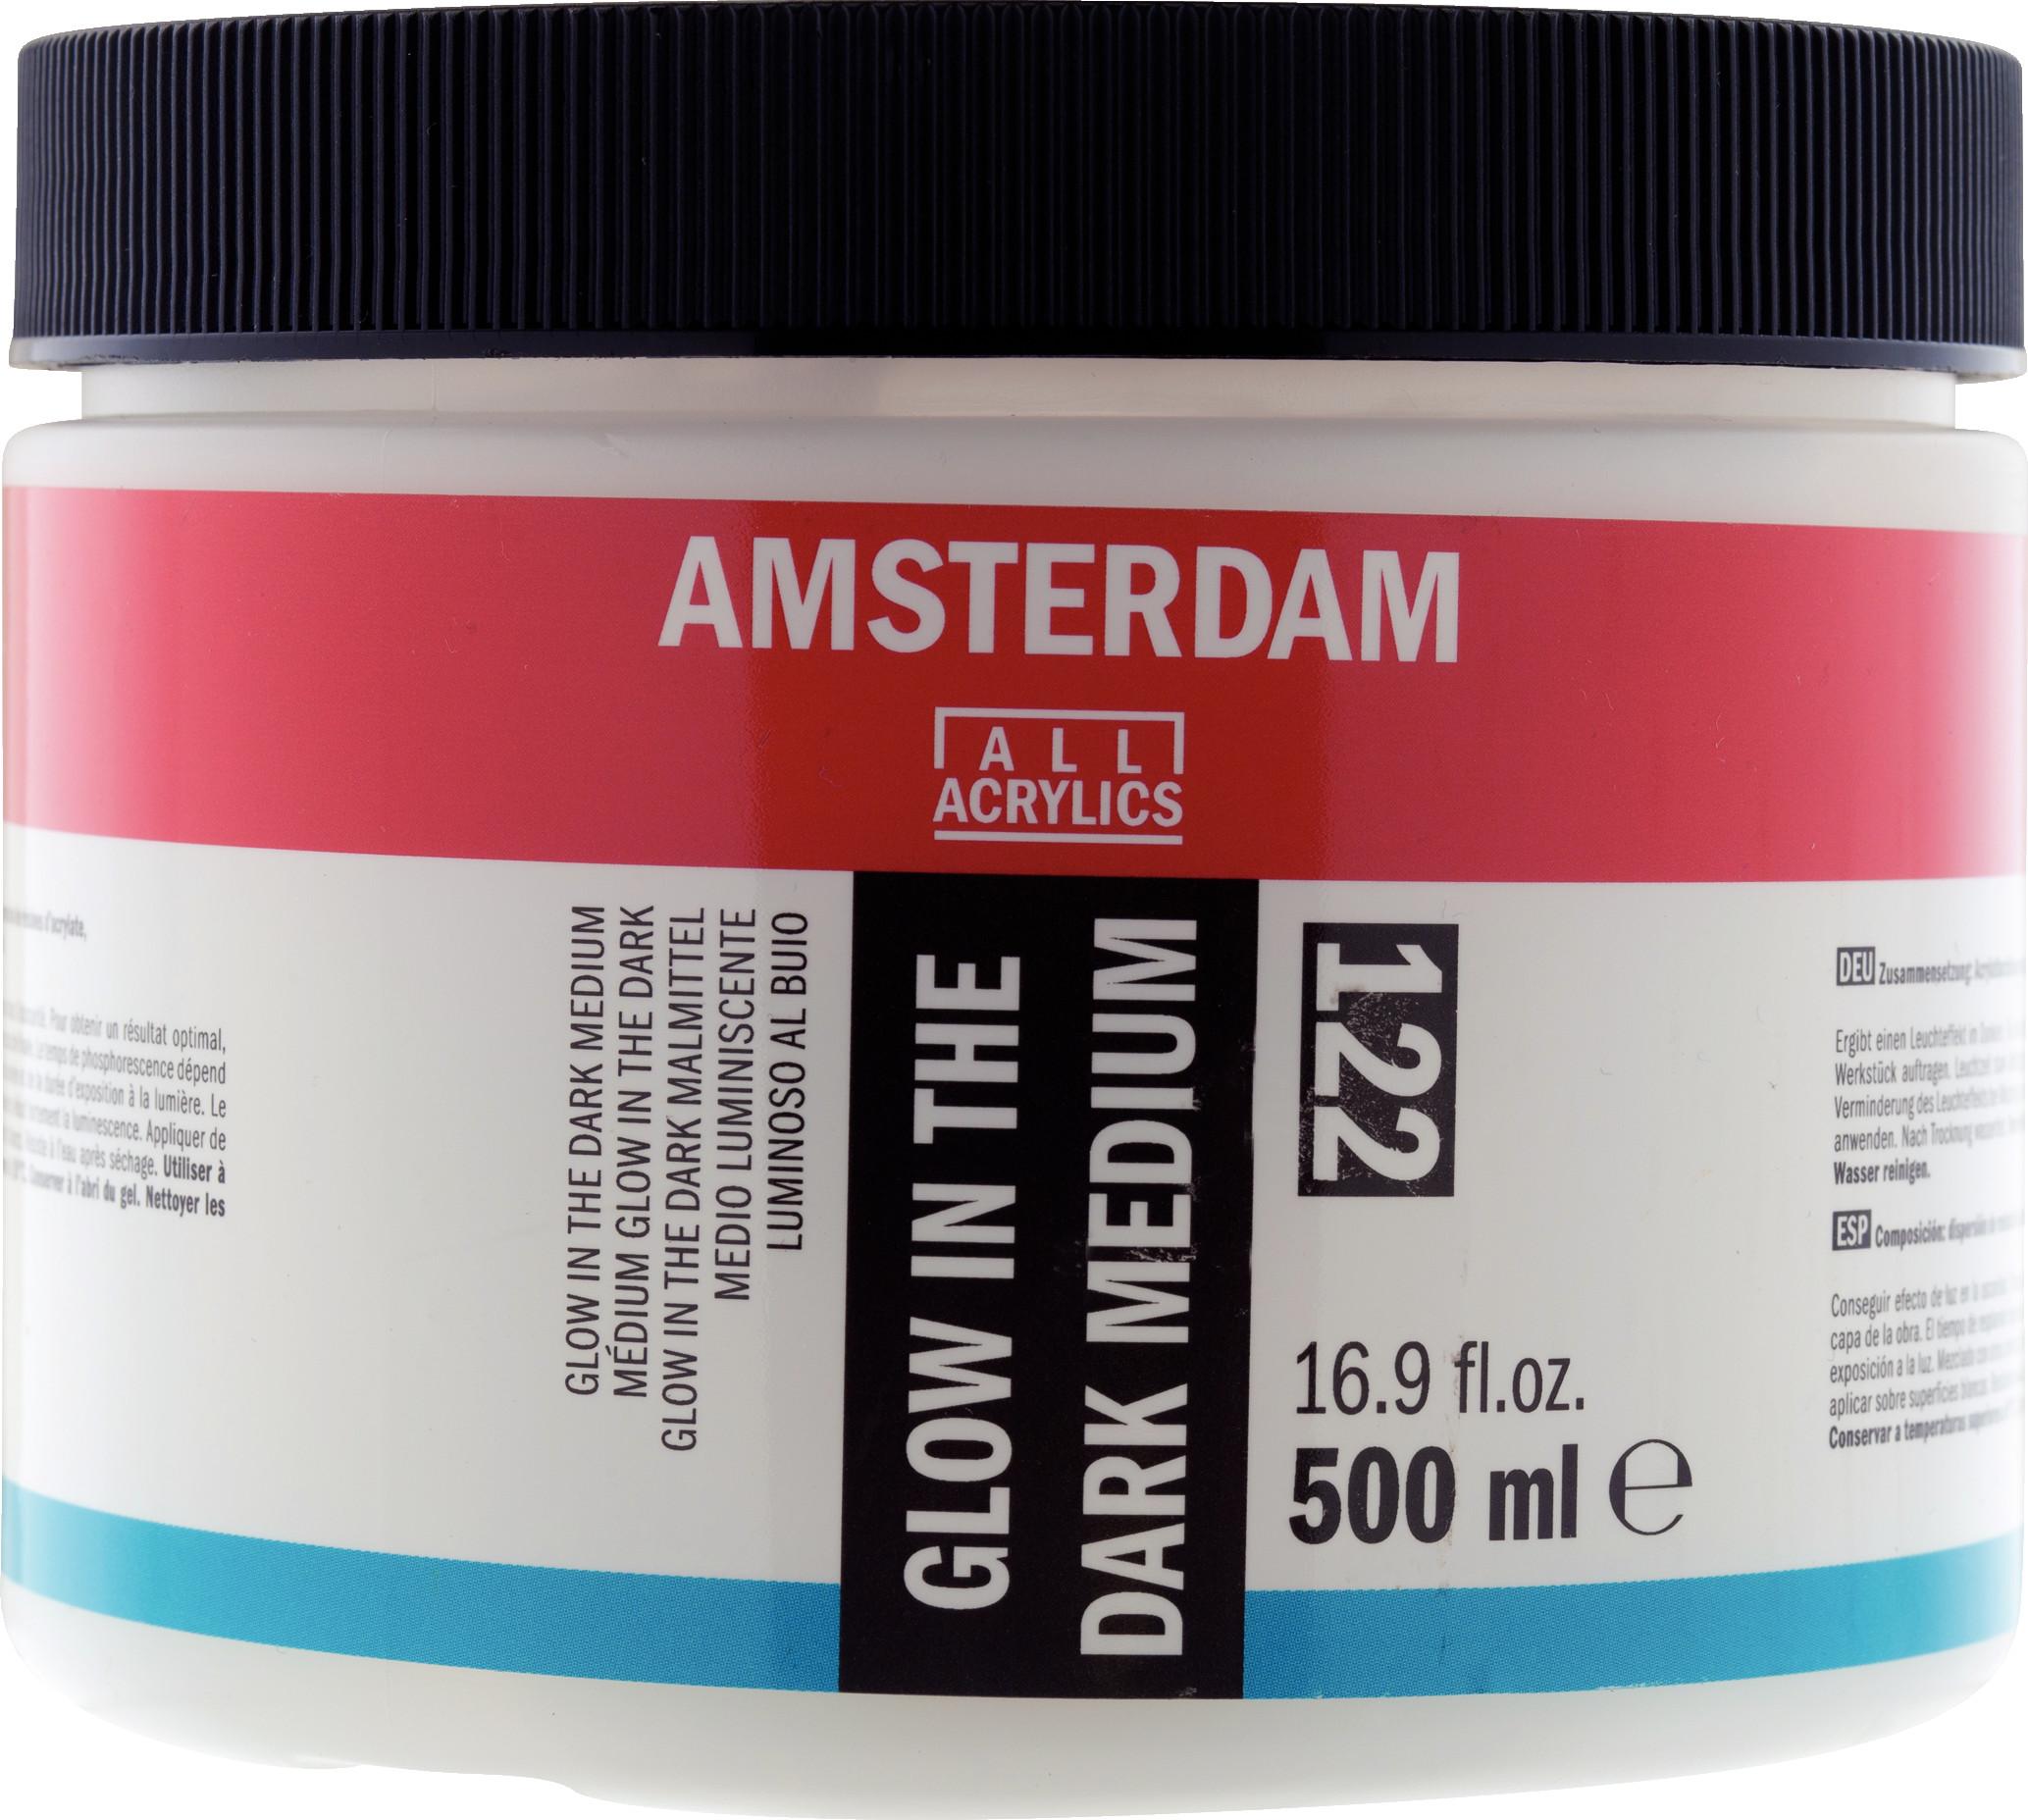 Amsterdam Glow-in-the-Dark Medium Jar 500 ml